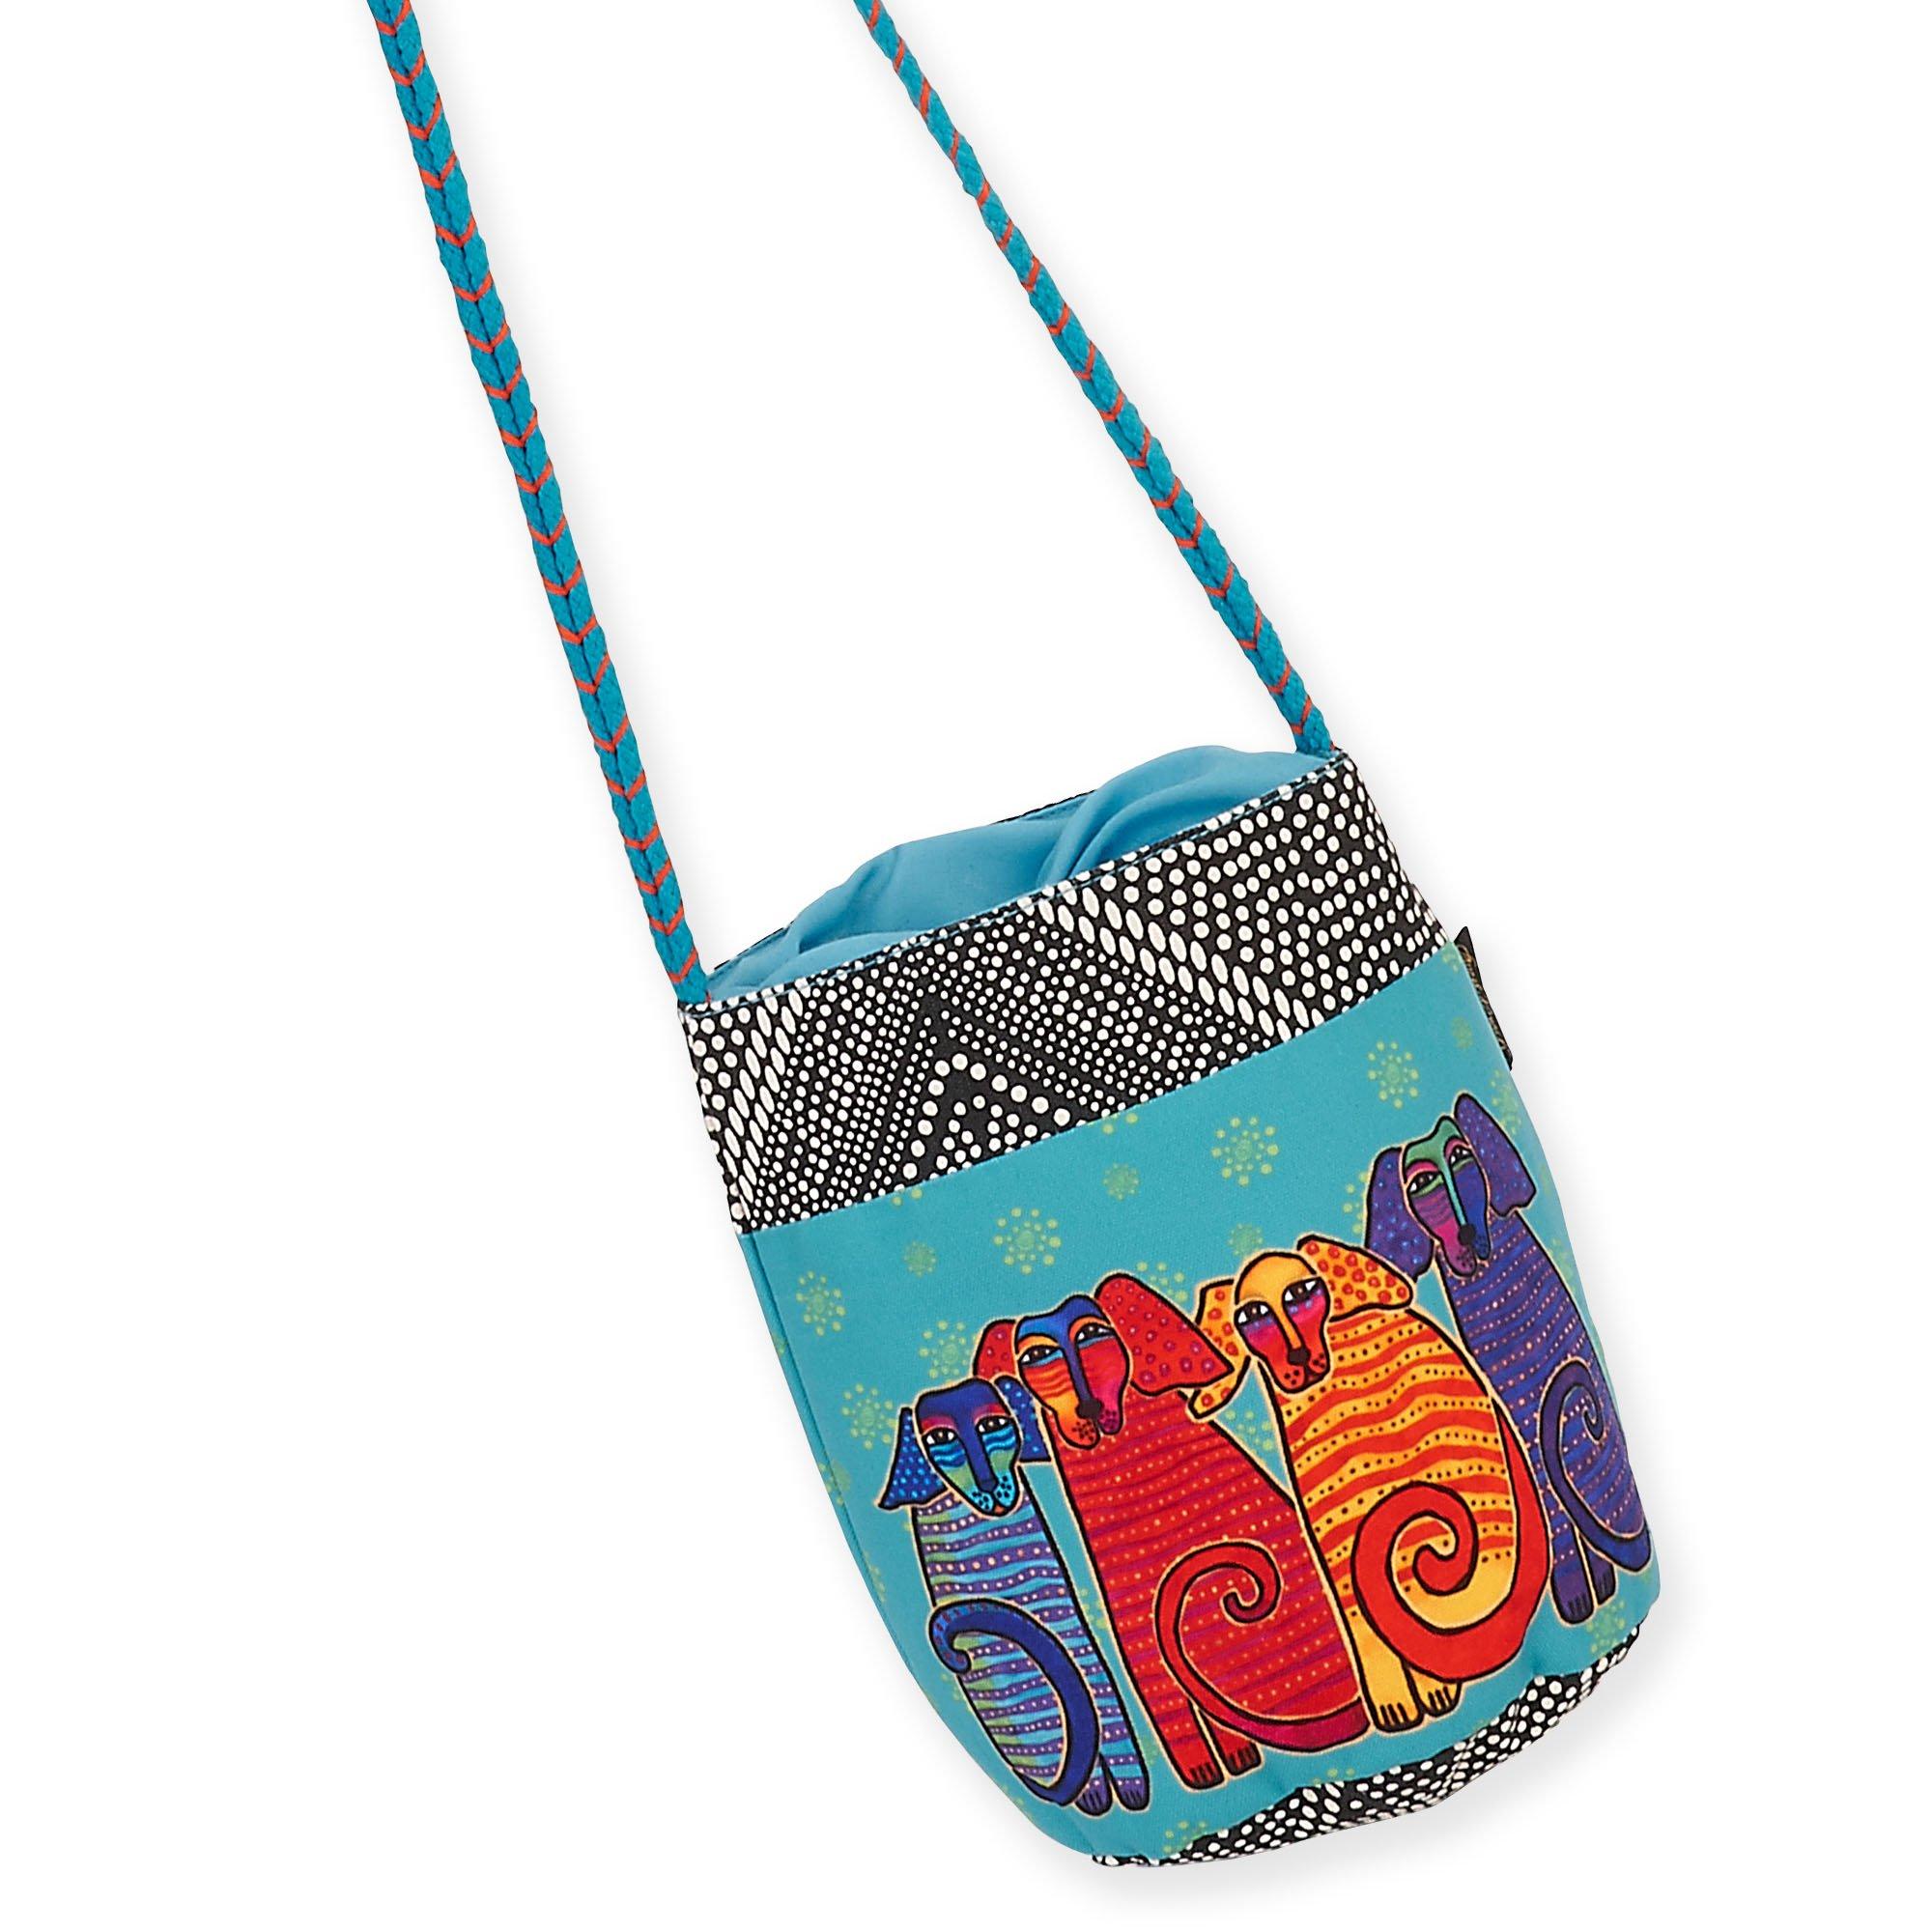 Laurel Burch Drawstring Cross-Body Bag 5700 (G. Canine Friends)